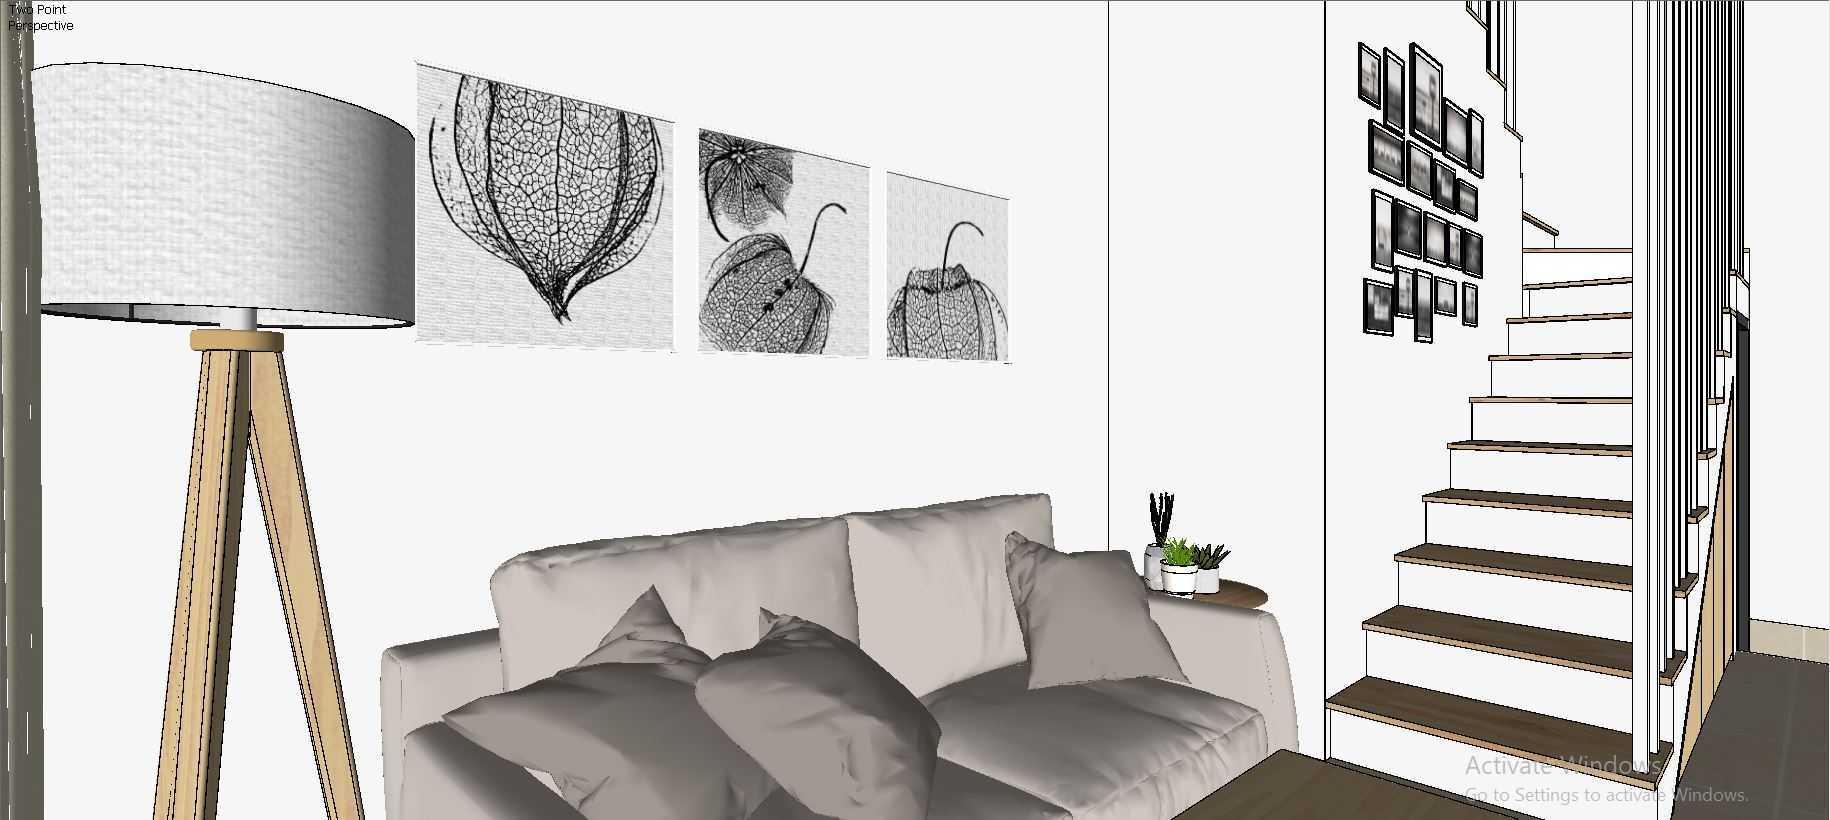 Arta Studio Billa's House Kec. Sawangan, Kota Depok, Jawa Barat, Indonesia Kec. Sawangan, Kota Depok, Jawa Barat, Indonesia Arief-Muhammad-Nasution-Billas-House   108279